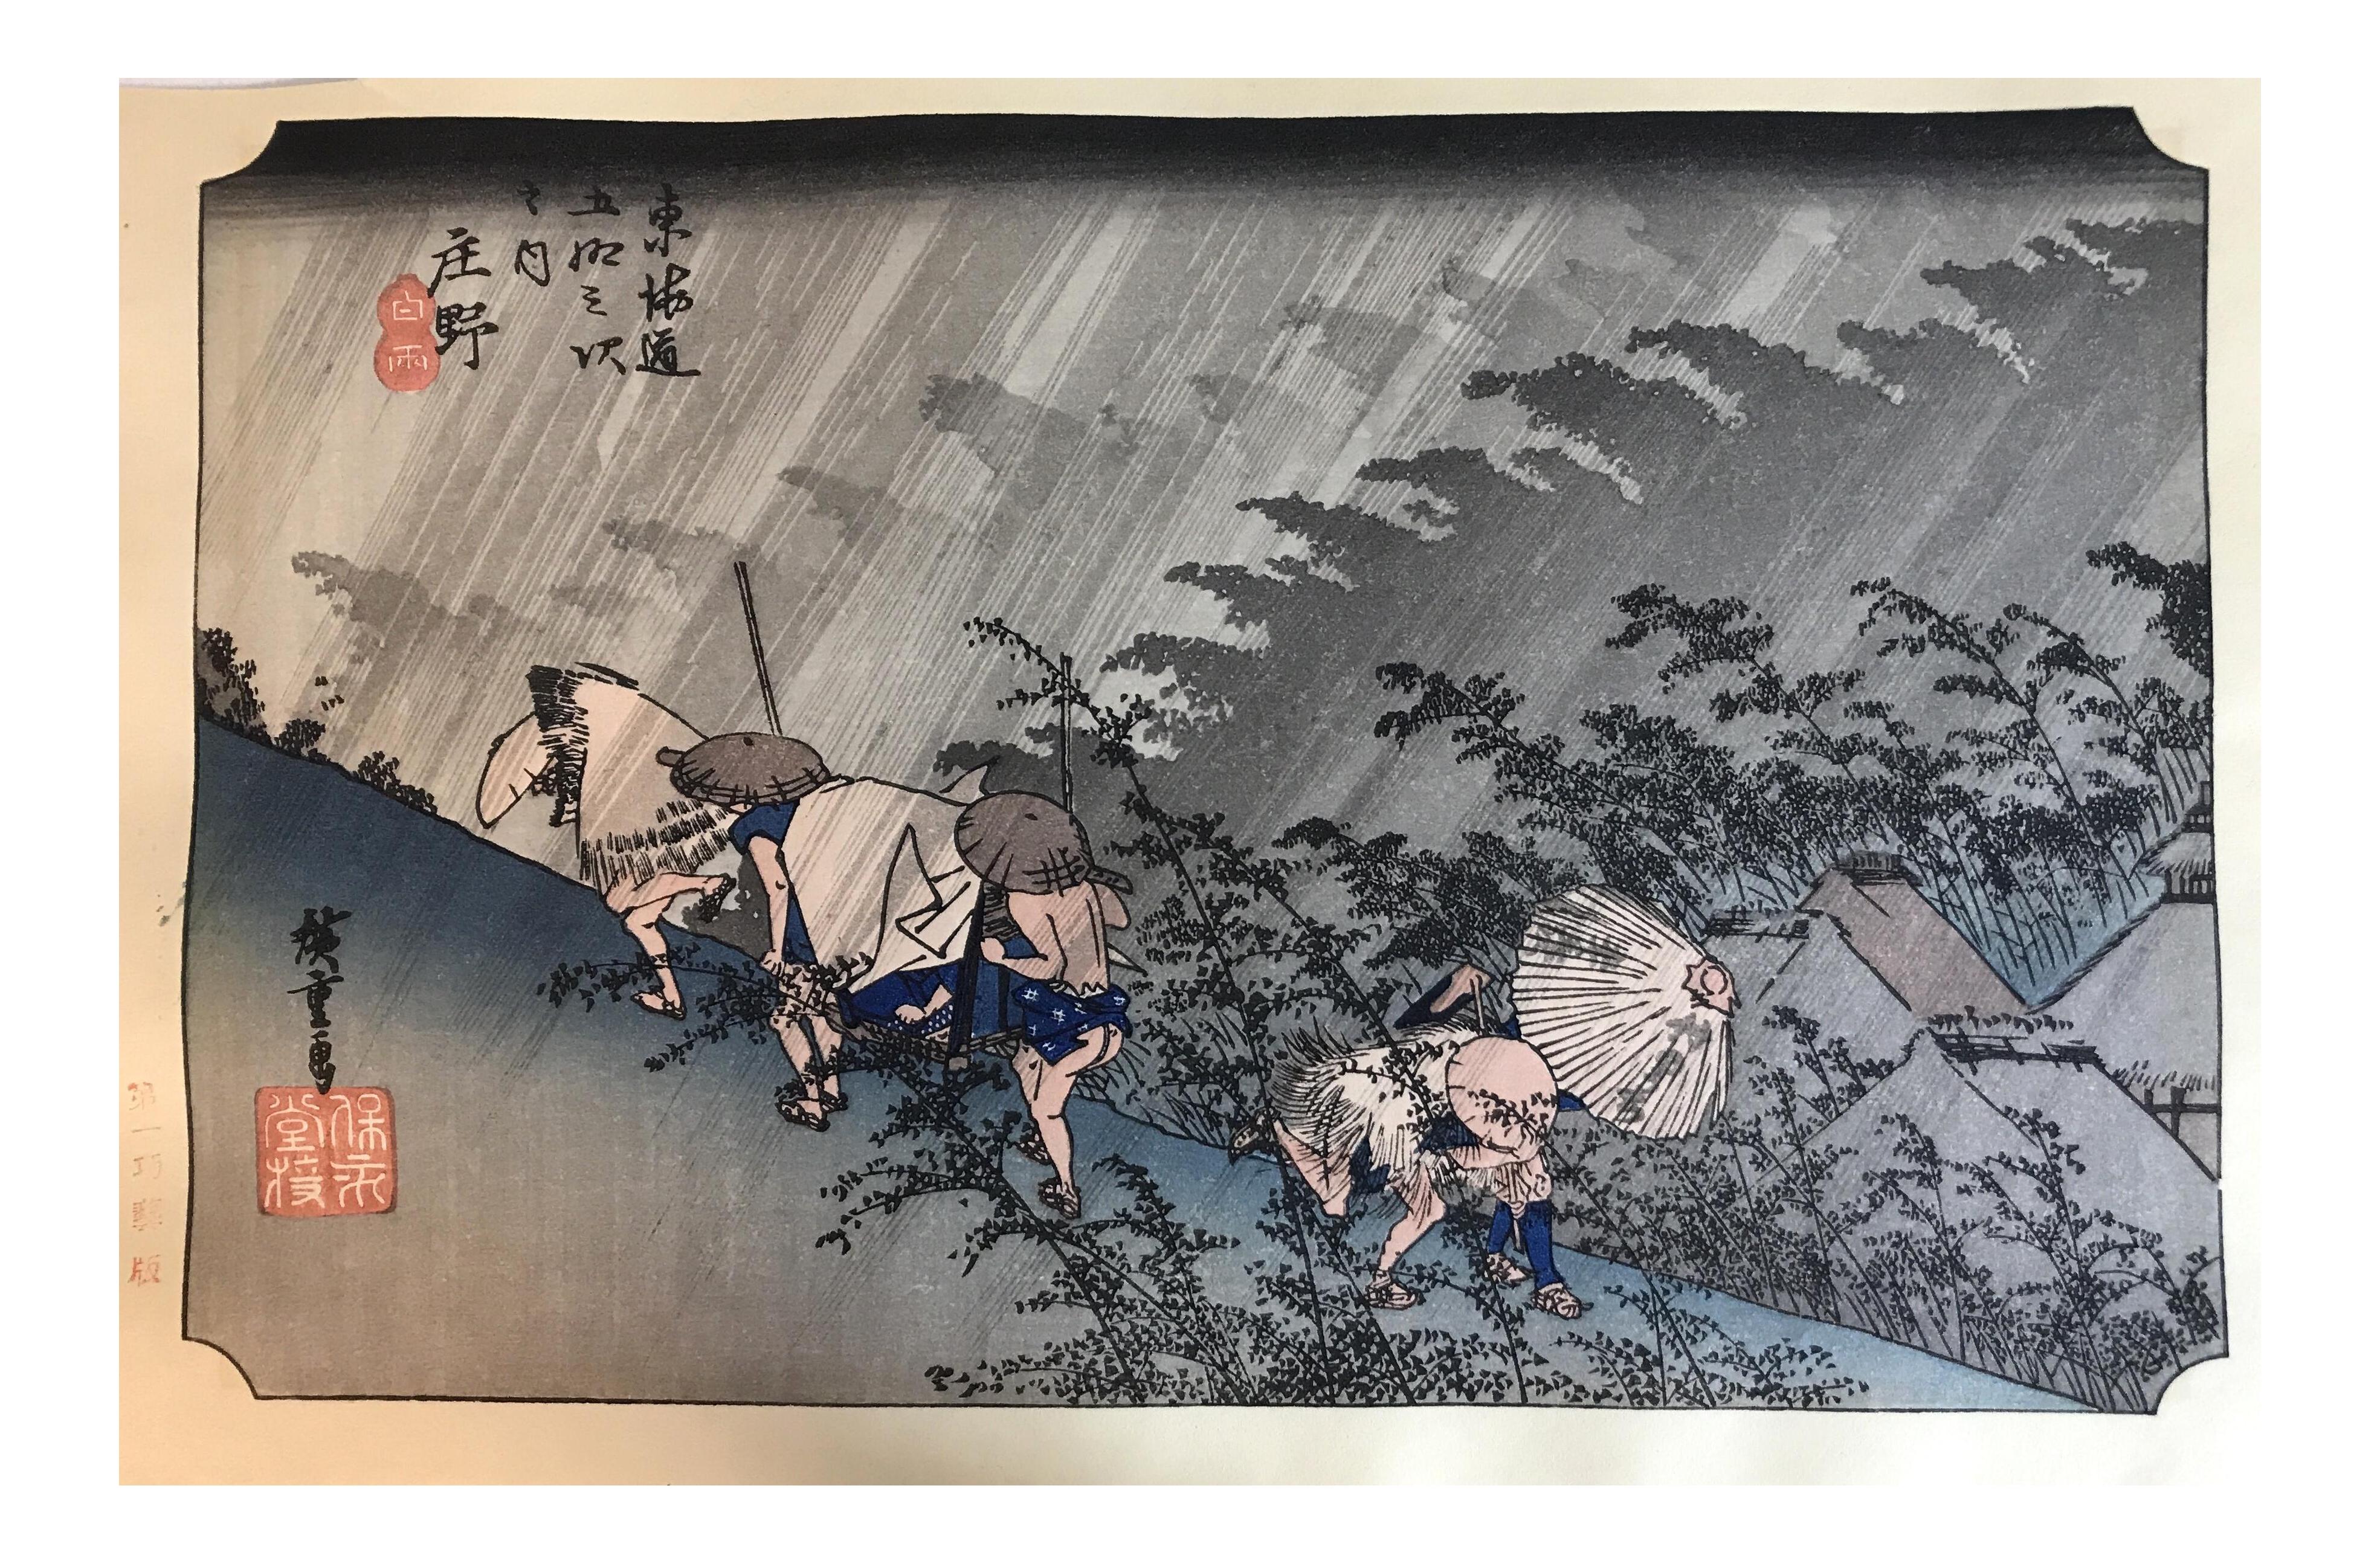 Vintage Mid Century Utagawa Hiroshige Sudden Shower At Shono Post War Ukiyo E Woodblock Print On Chairish Com Please Original Prints Ukiyoe Utagawa Hiroshige